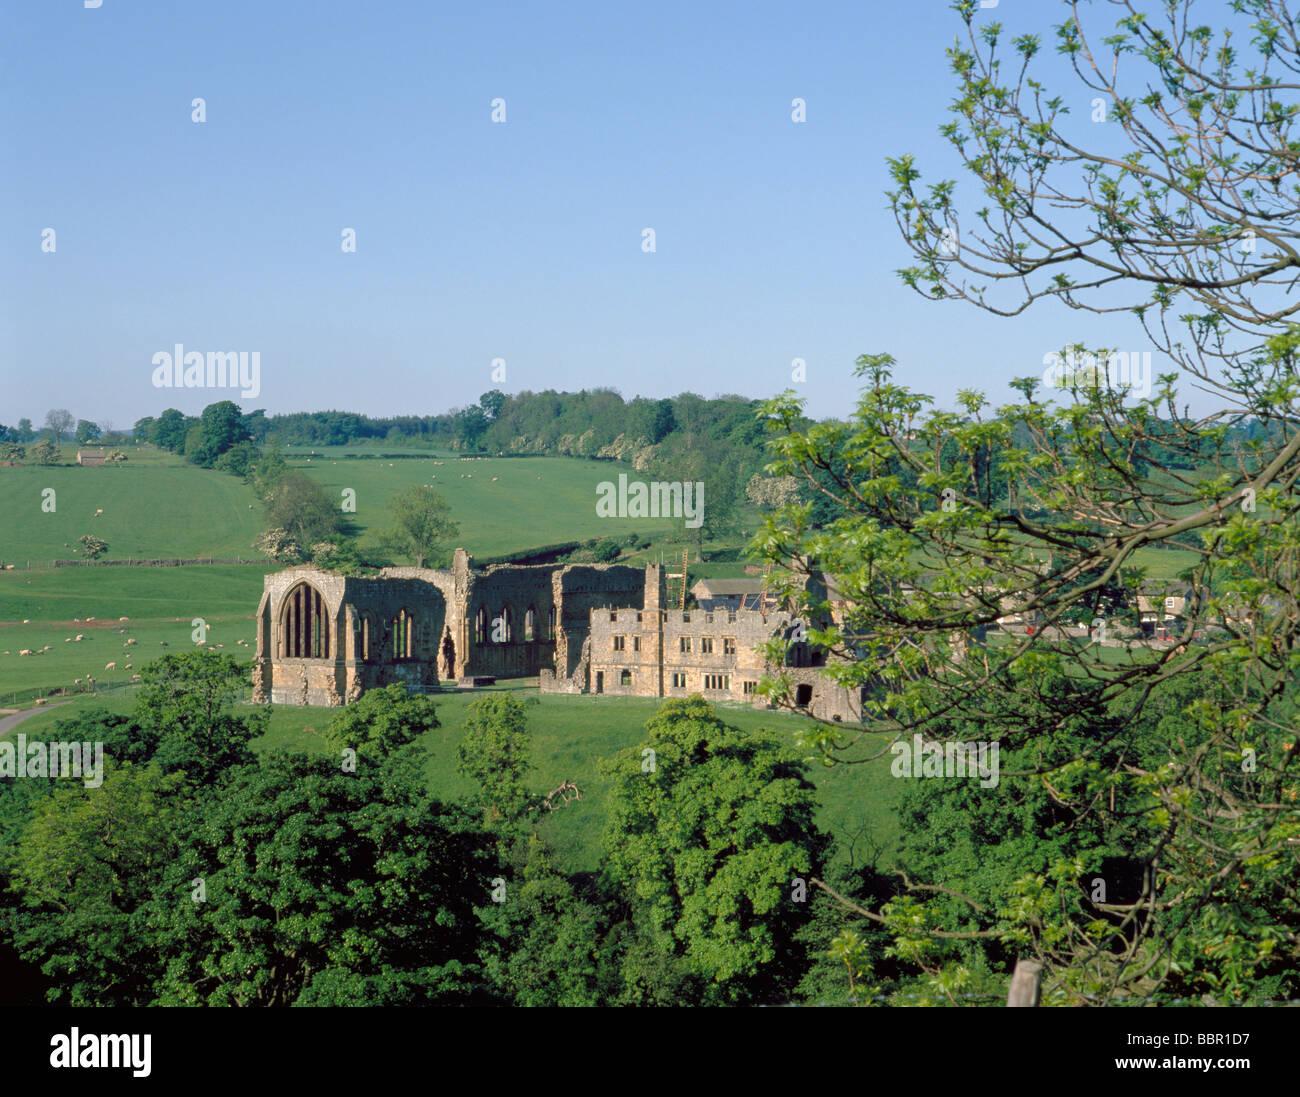 Ruins of Egglestone Abbey, near Barnard Castle, County Durham, England, UK. - Stock Image